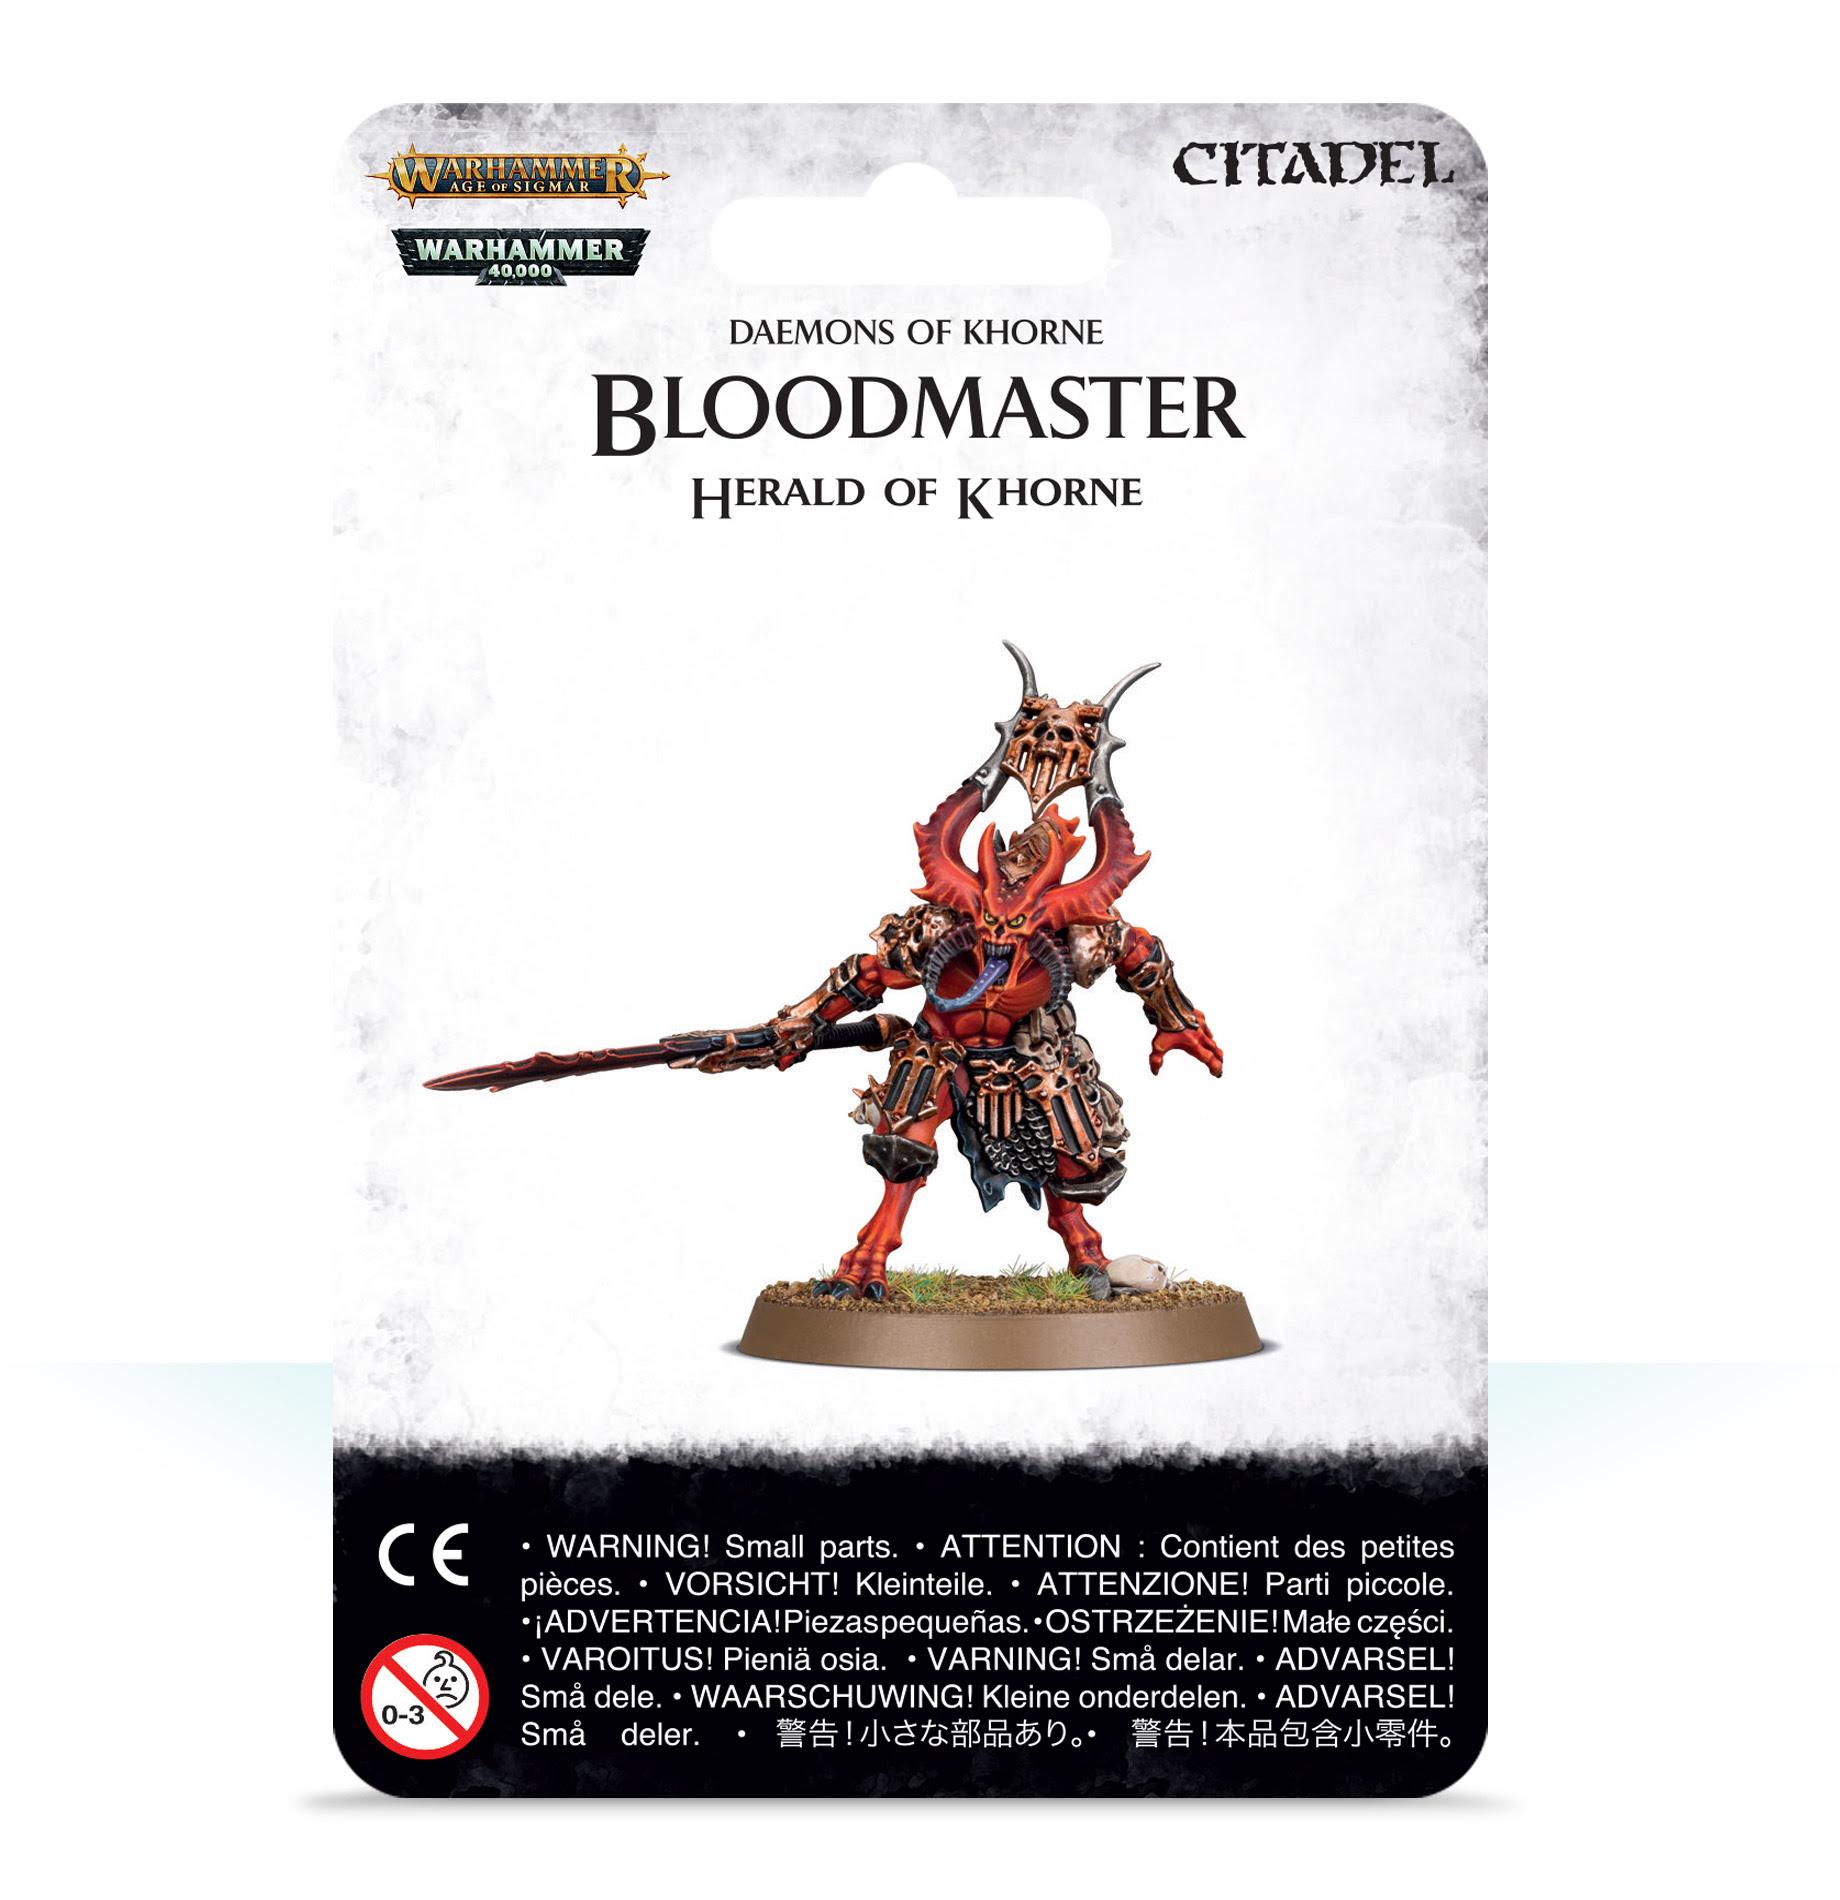 Bloodmaster Herald Of Khorne